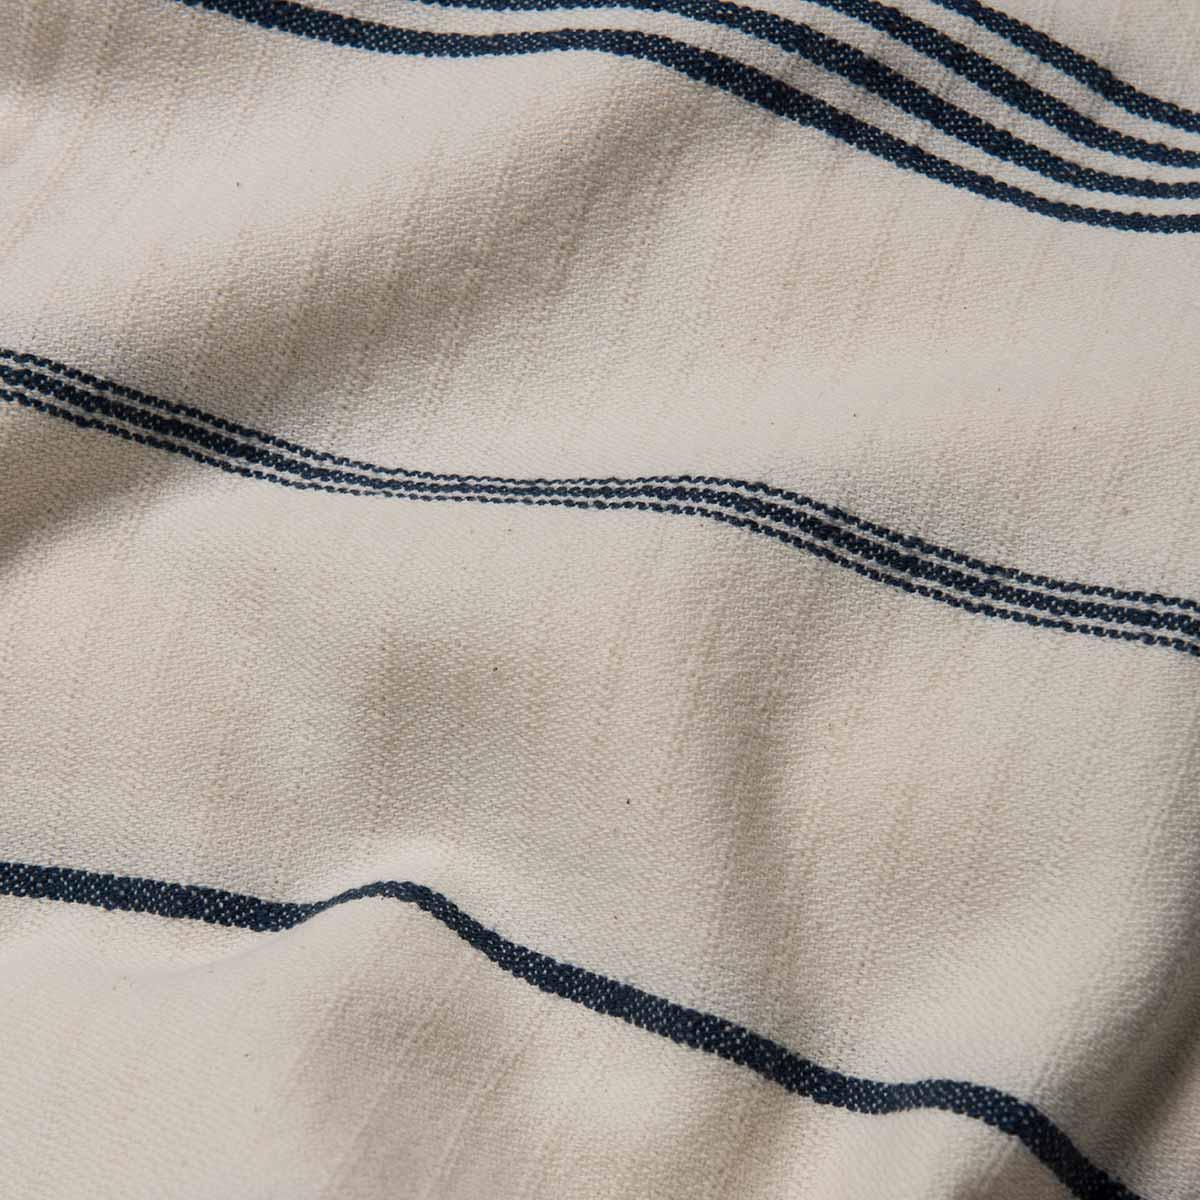 Peshtemal SultanCP - Navy Stripes